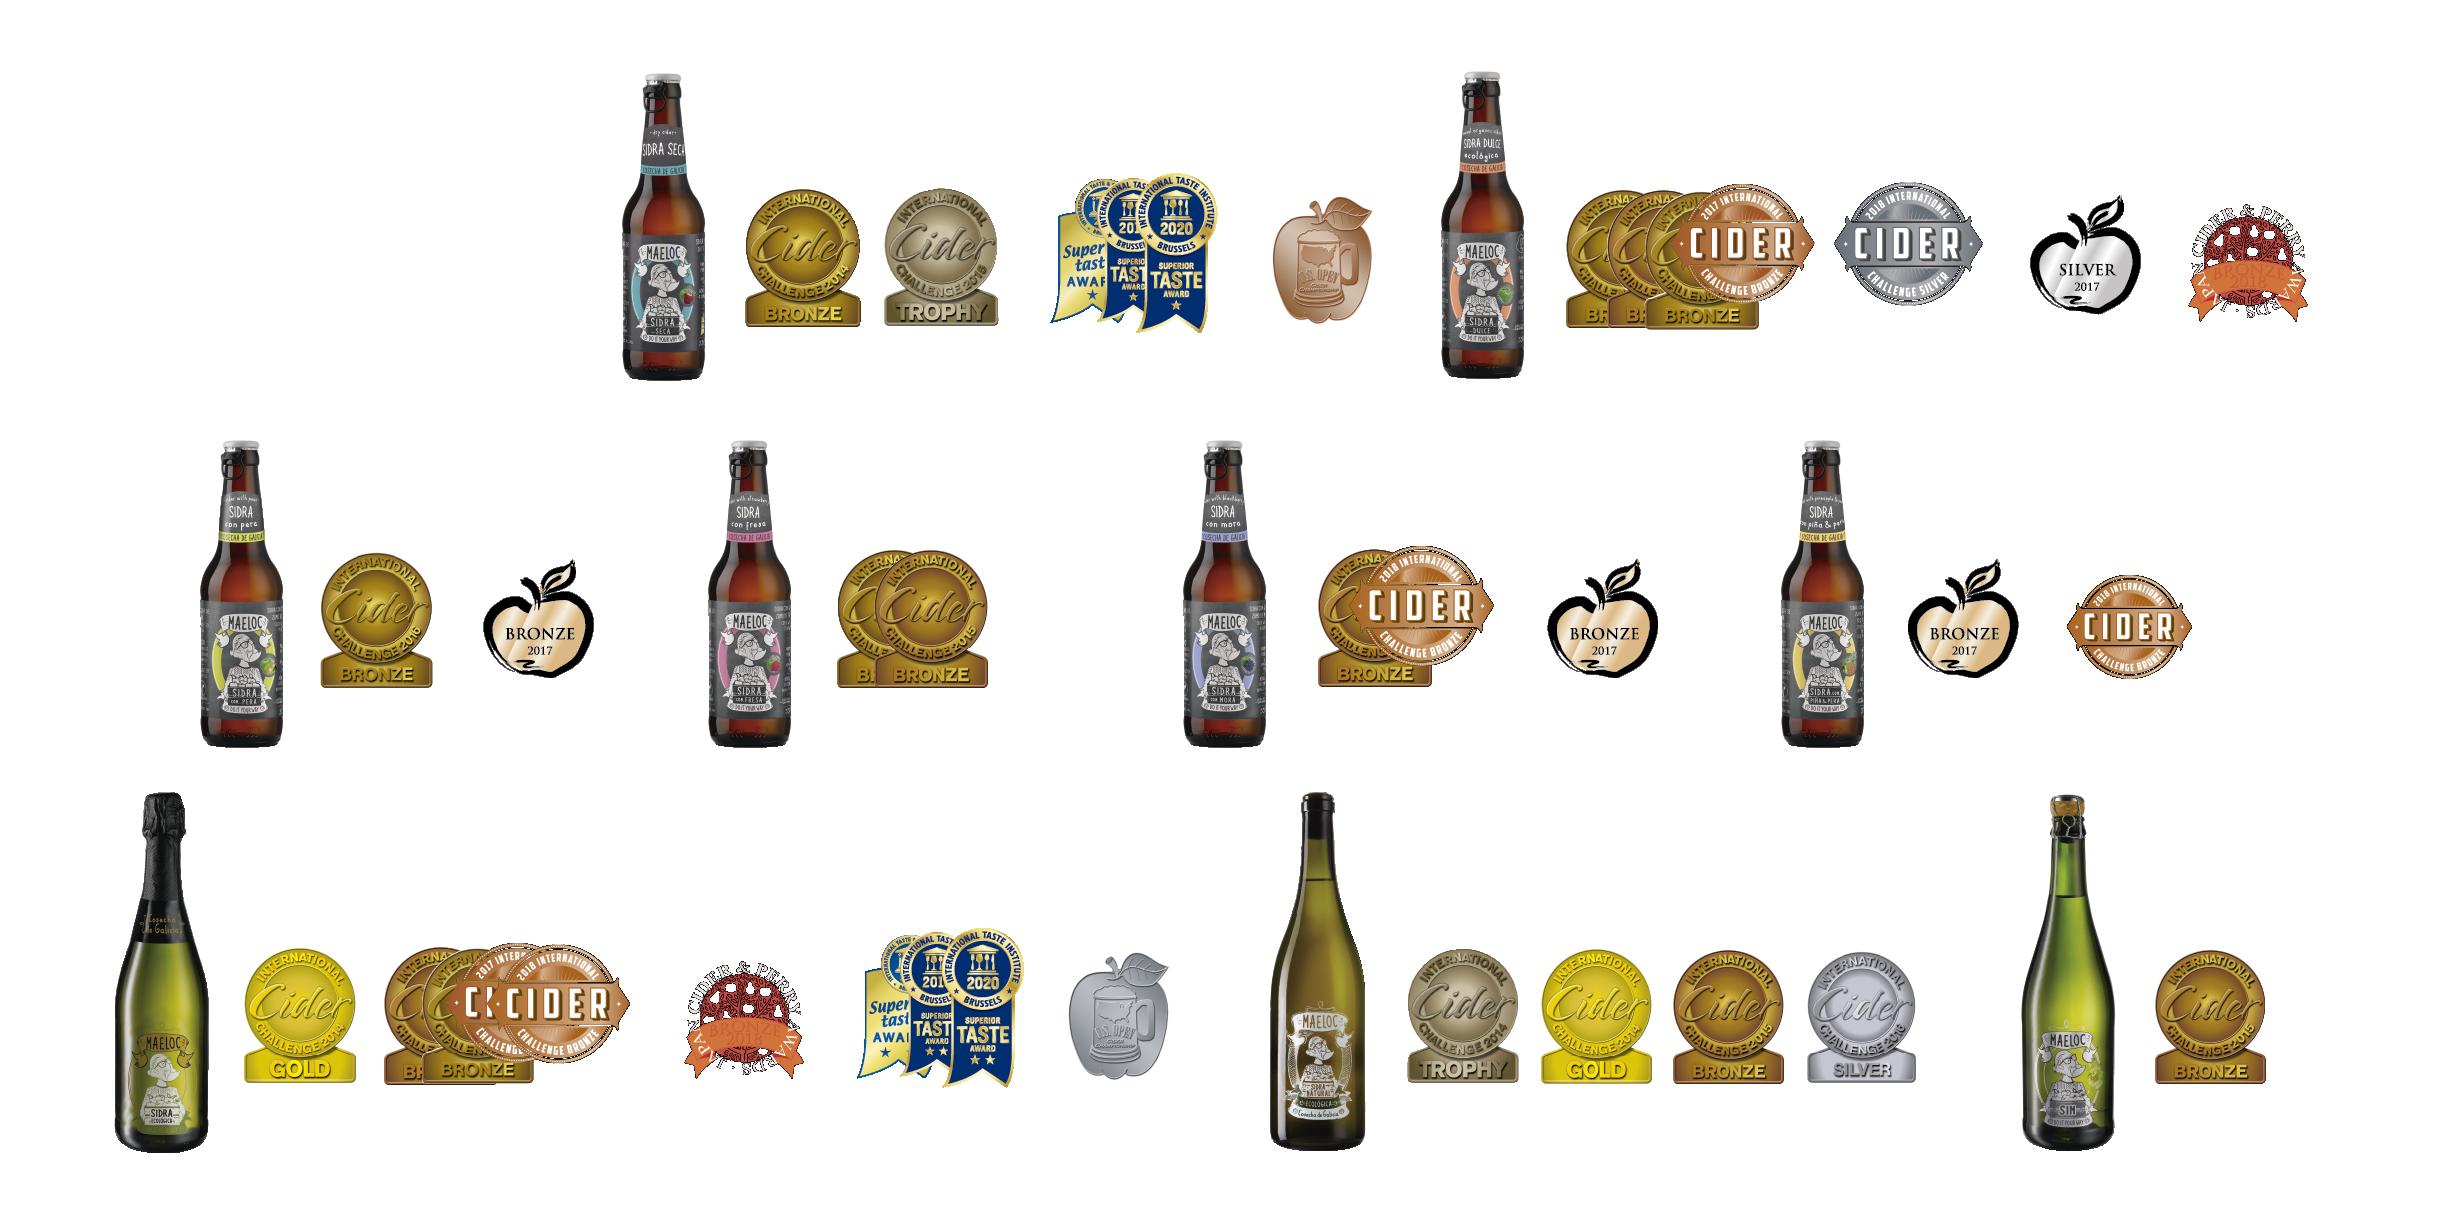 Maeloc Ciders Prizes